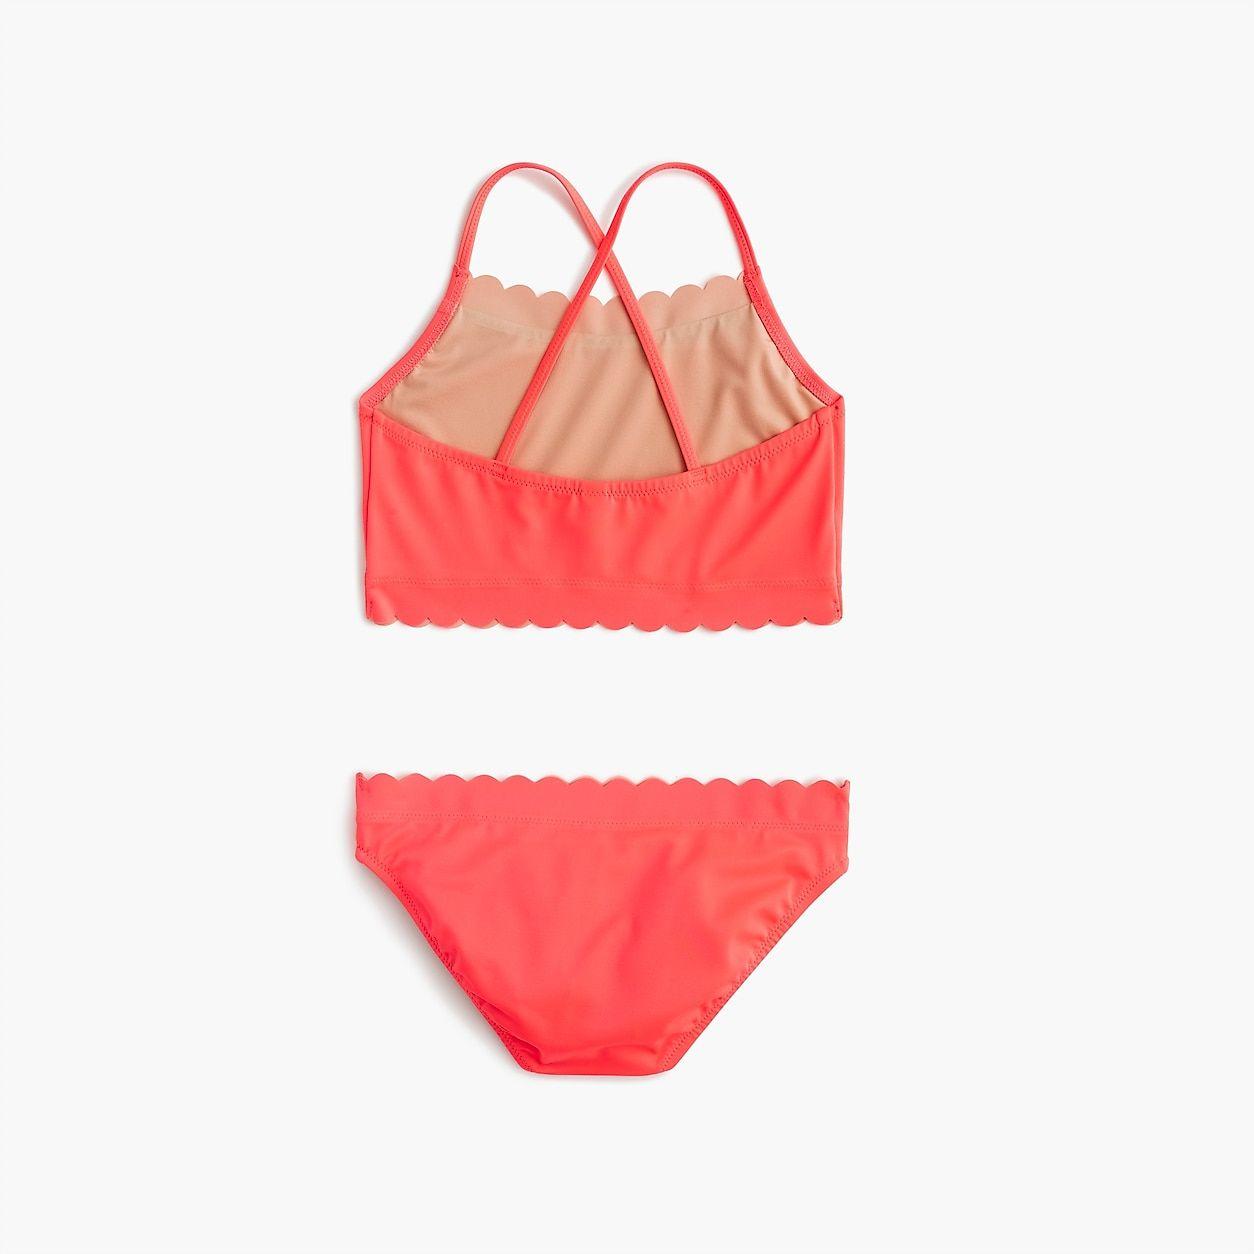 6199e1f82cb29 crewcuts Scalloped Cropped Tankini Set | Products | Trendy swimwear ...